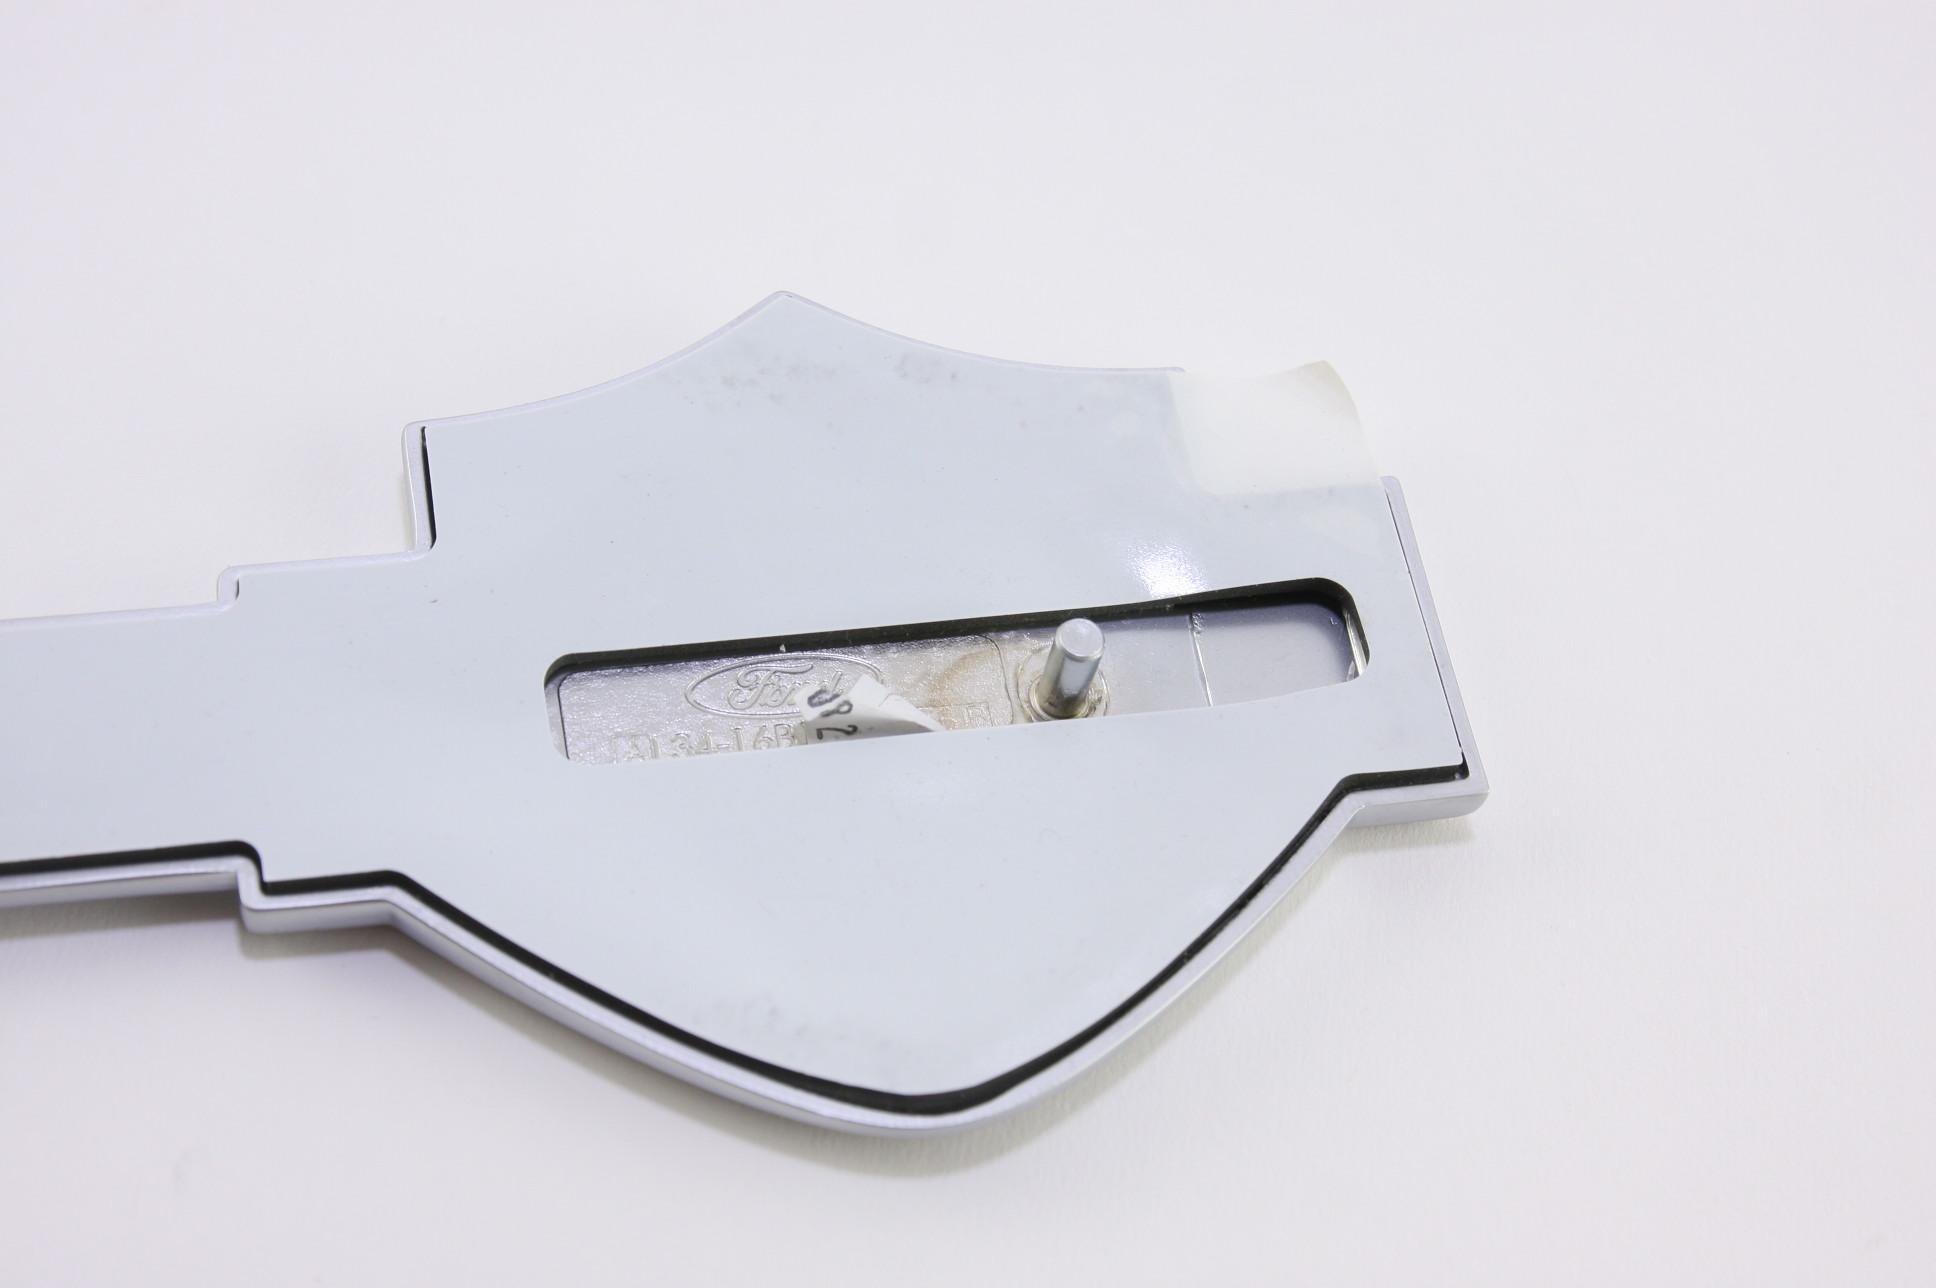 *** New Genuine Ford OEM BL3Z16720B 09-12 F150 Harley Davidson Free Shipping NIP - image 8